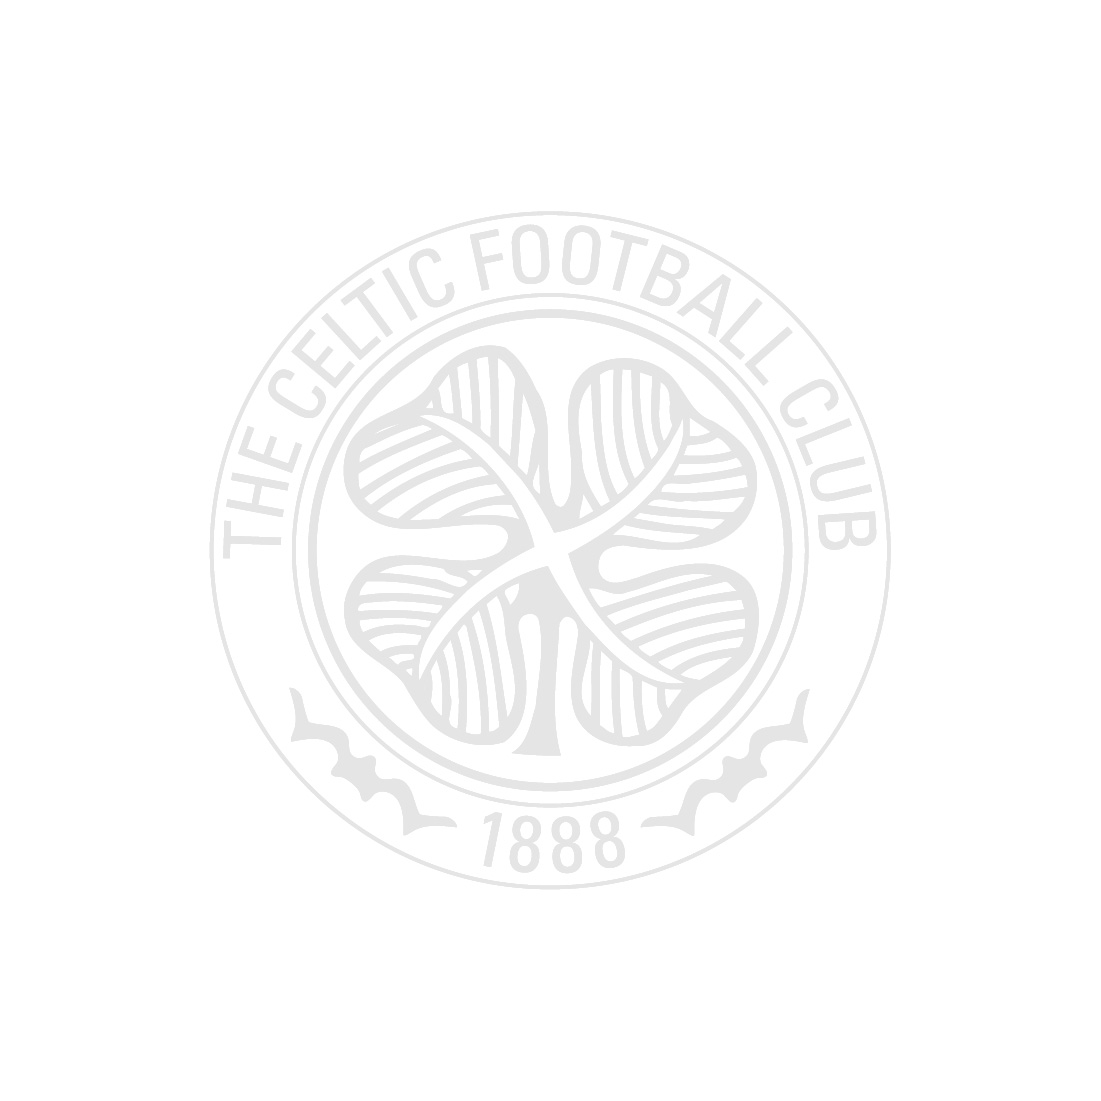 Celtic FC Foundation T-shirt